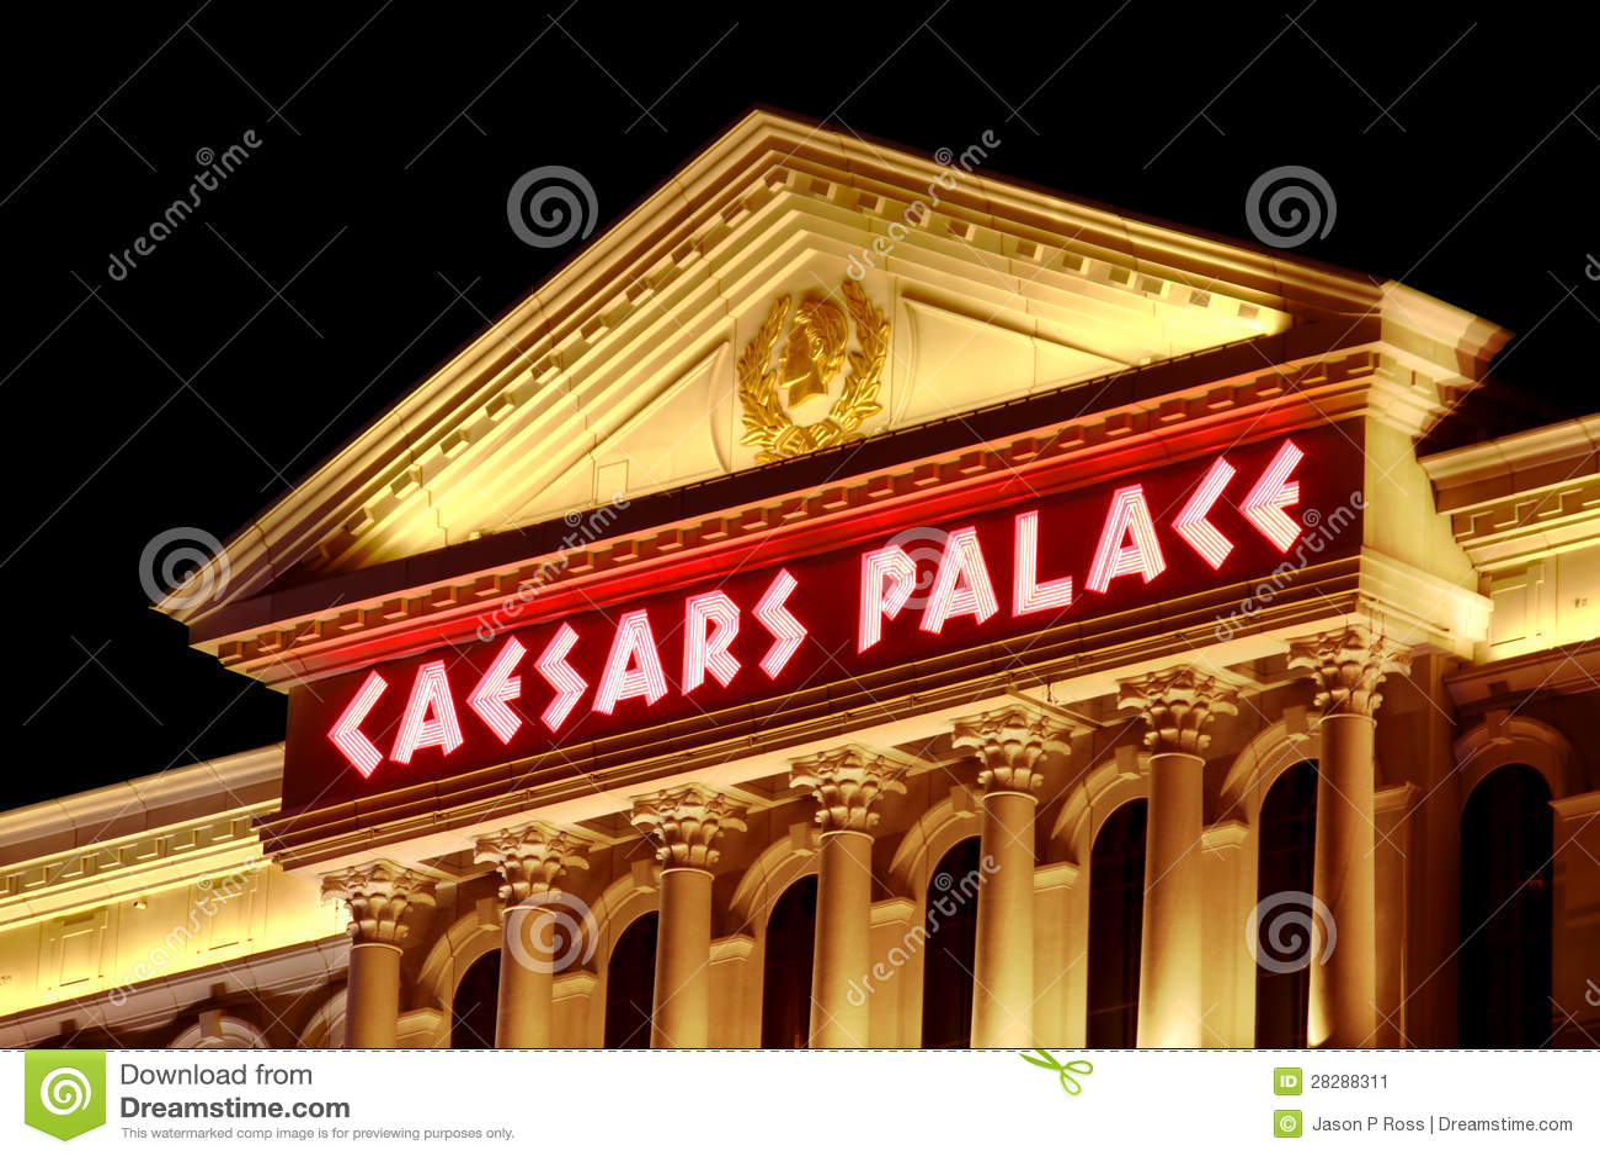 Cesar palace casino 14